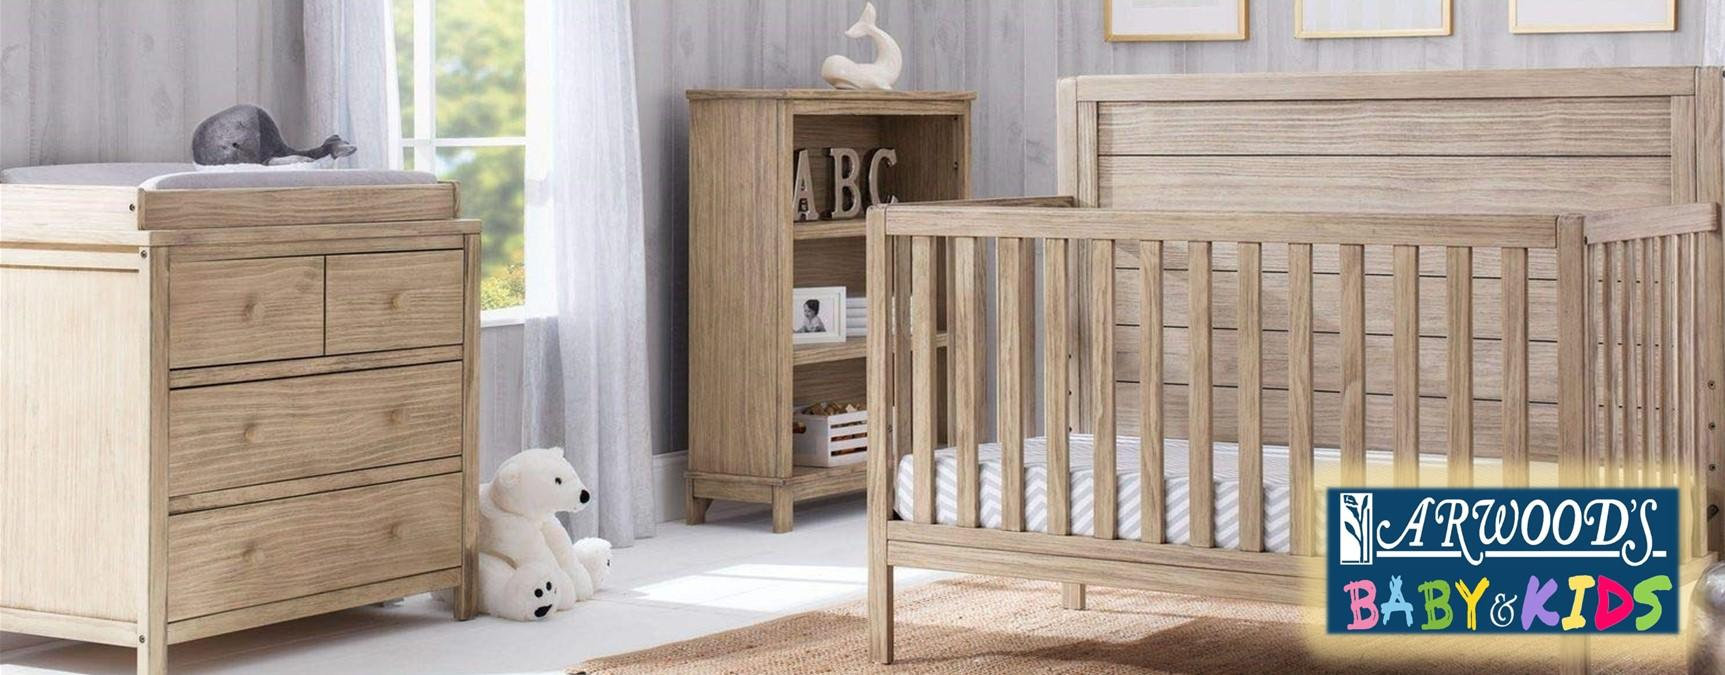 Nursery & Baby furniture on sale at Missouri's LARGEST Furniture Store.